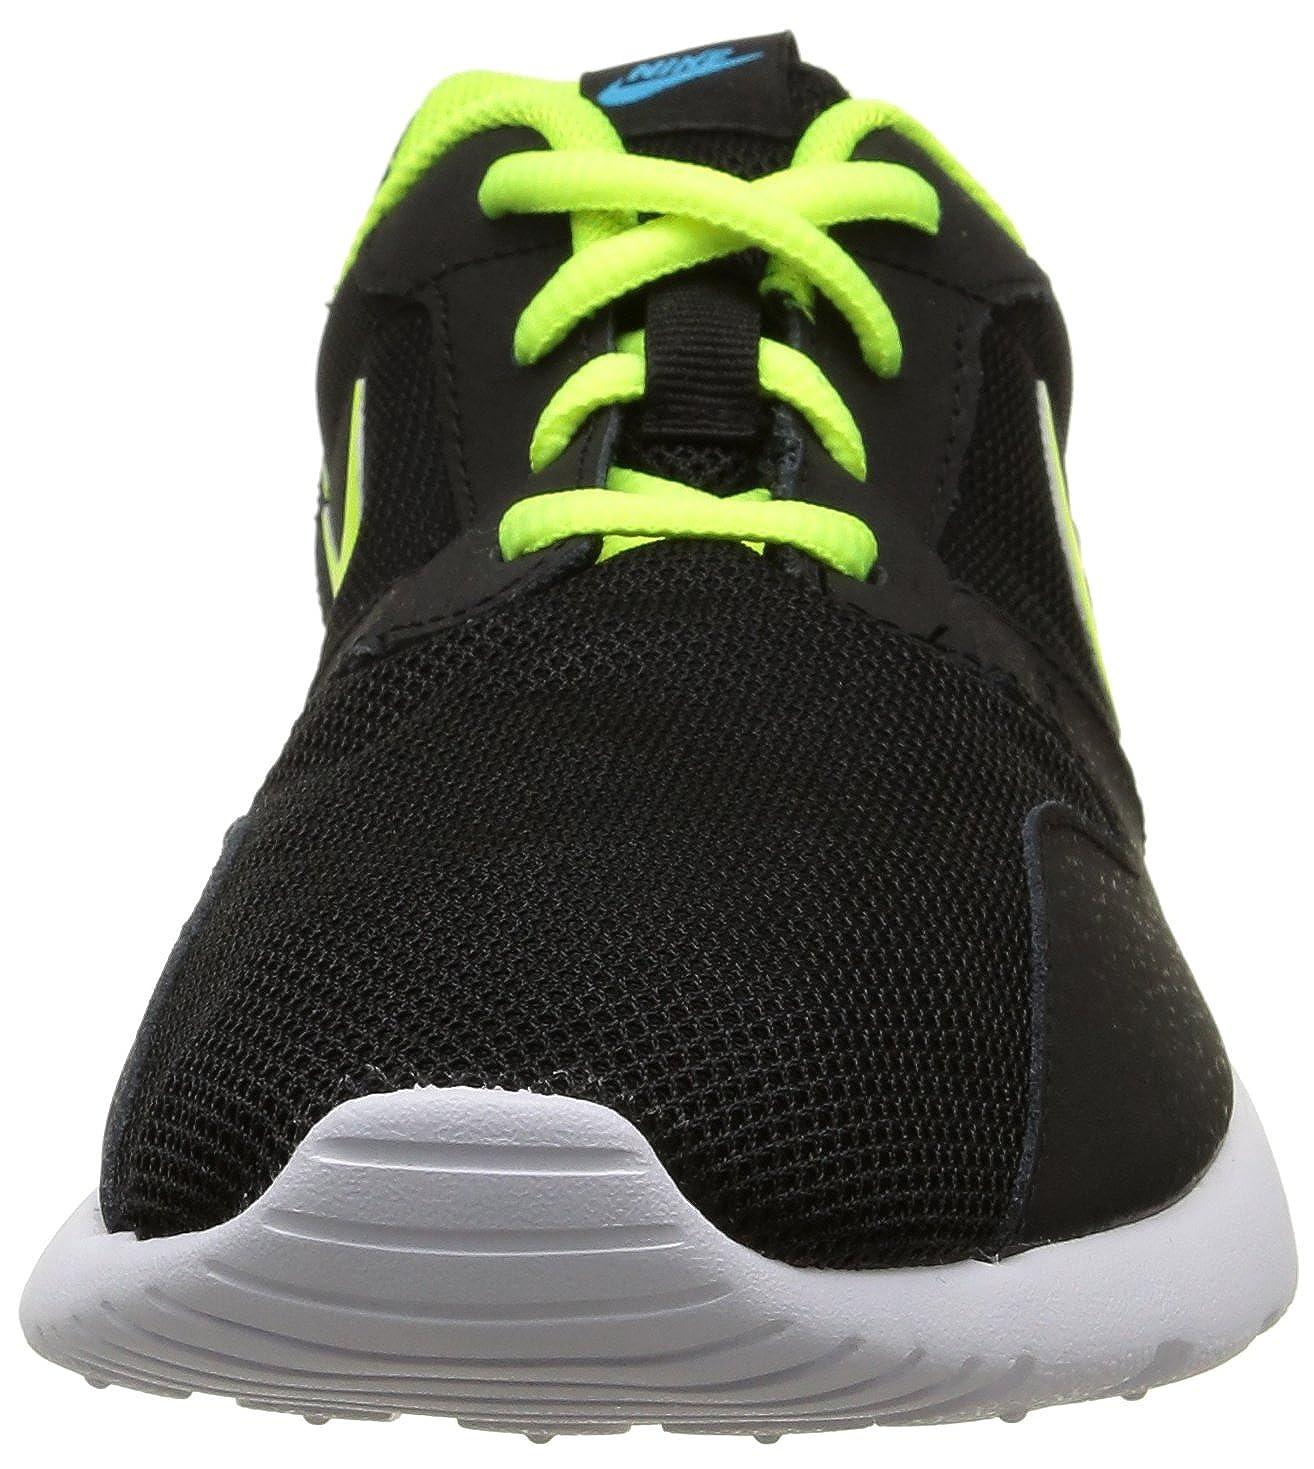 new arrival 9f6ad 64616 Nike , Sneakers Basses garçon - Noir - Schwarz Fluo Gelb, 40 EU  Amazon.fr   Chaussures et Sacs